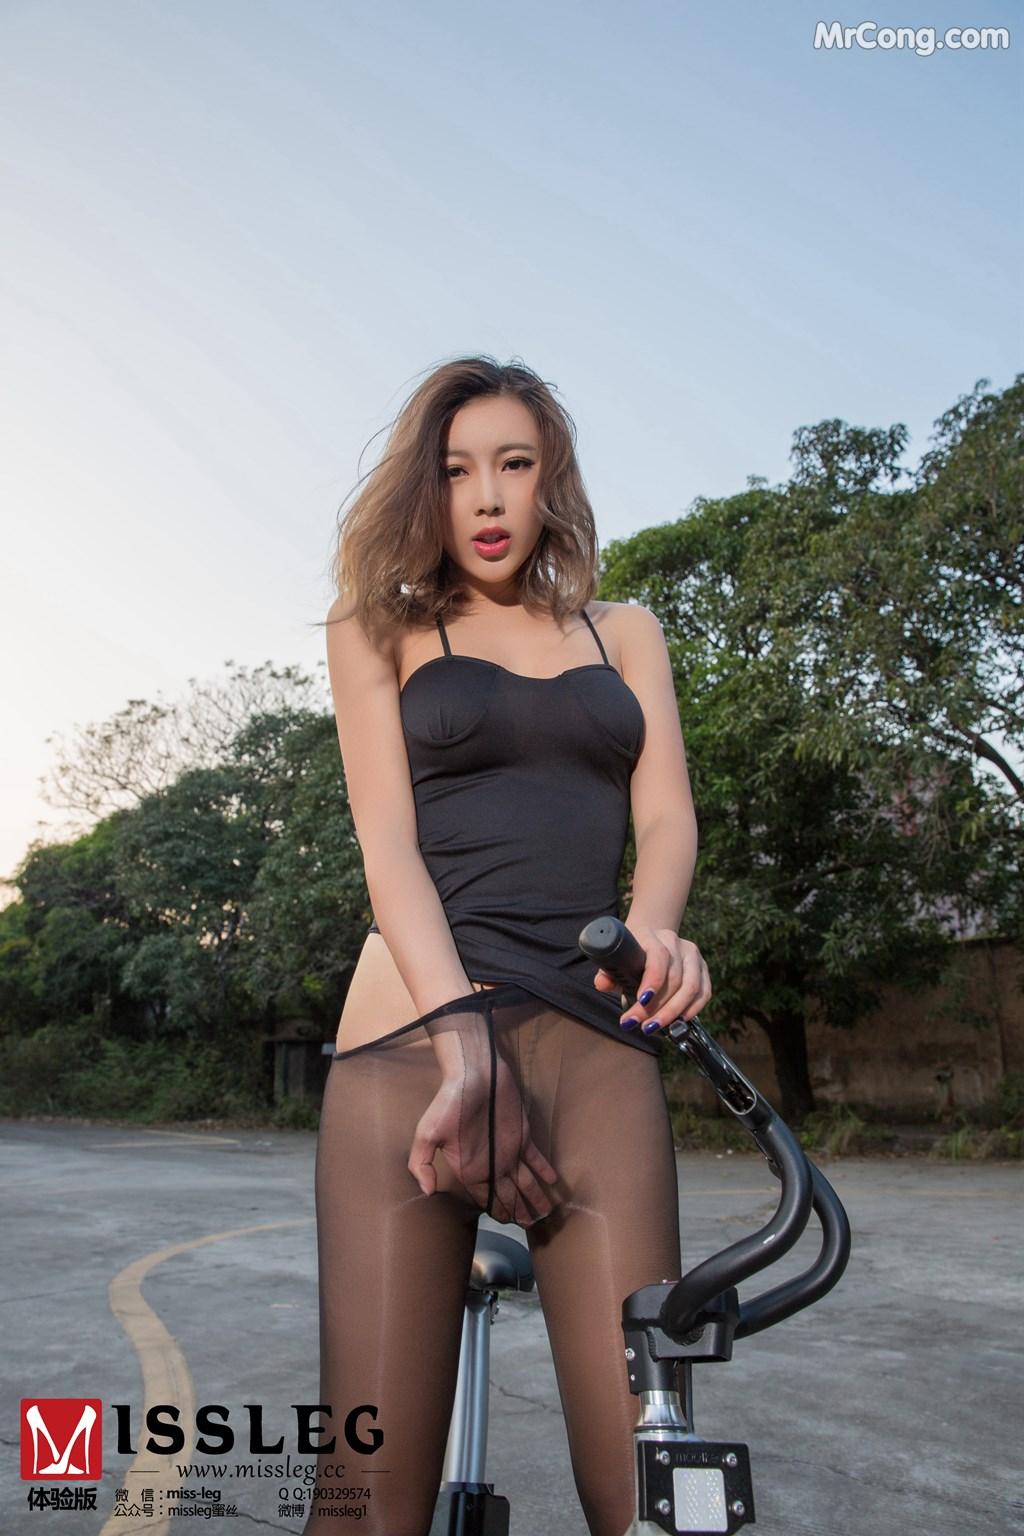 Image MISSLEG-2018-02-09-No.007-Yao-Yao-MrCong.com-008 in post MISSLEG 2018-02-09 No.007: Người mẫu Yao Yao (遥遥) (8 ảnh)